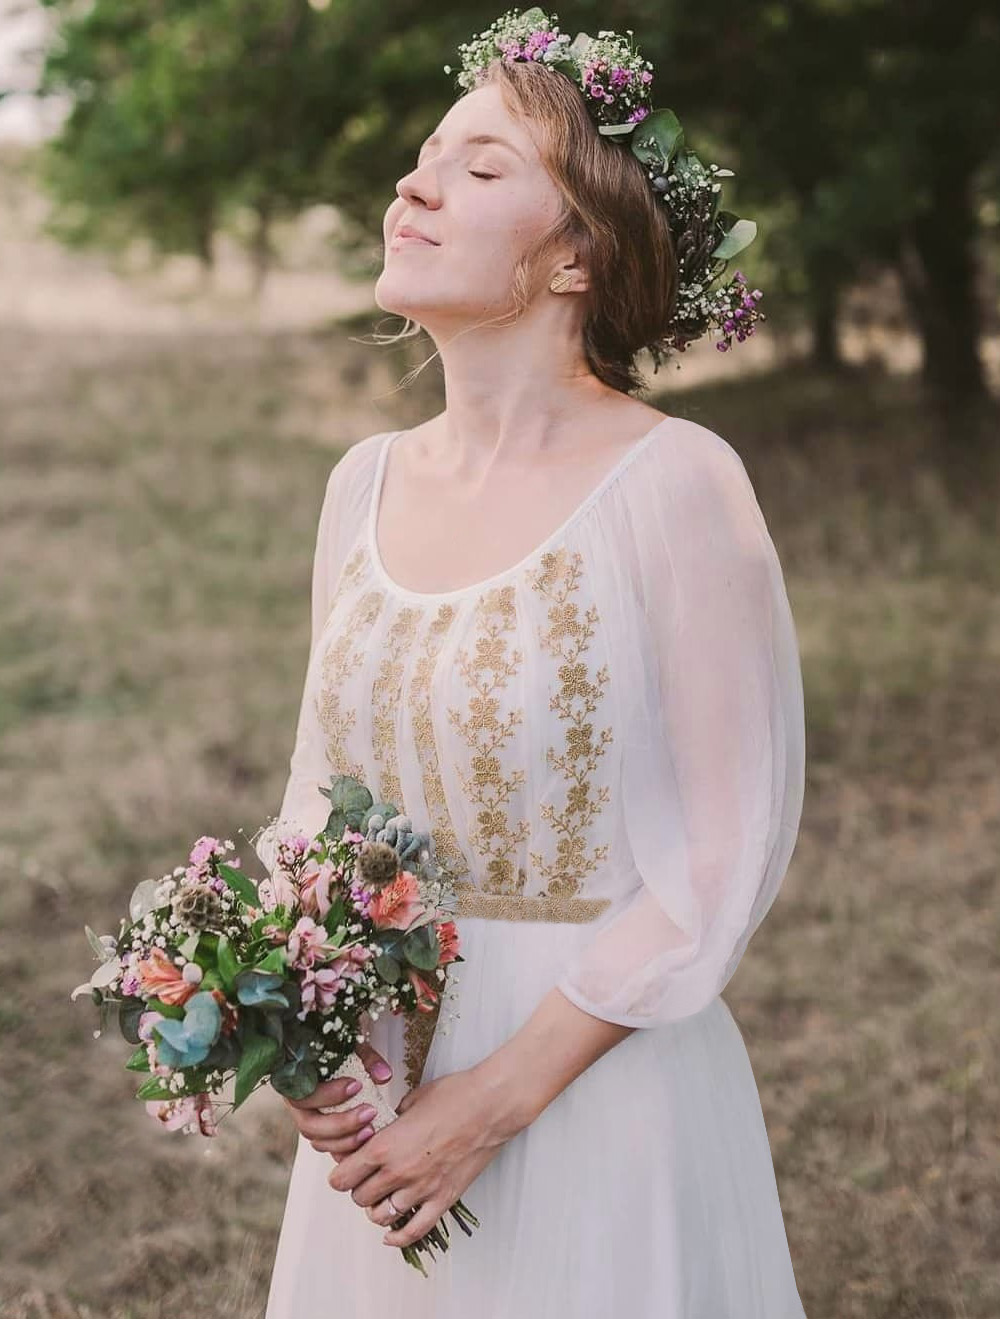 Rochia De Mireasa Traditionala Nunta Tradiţionala Romaneasca